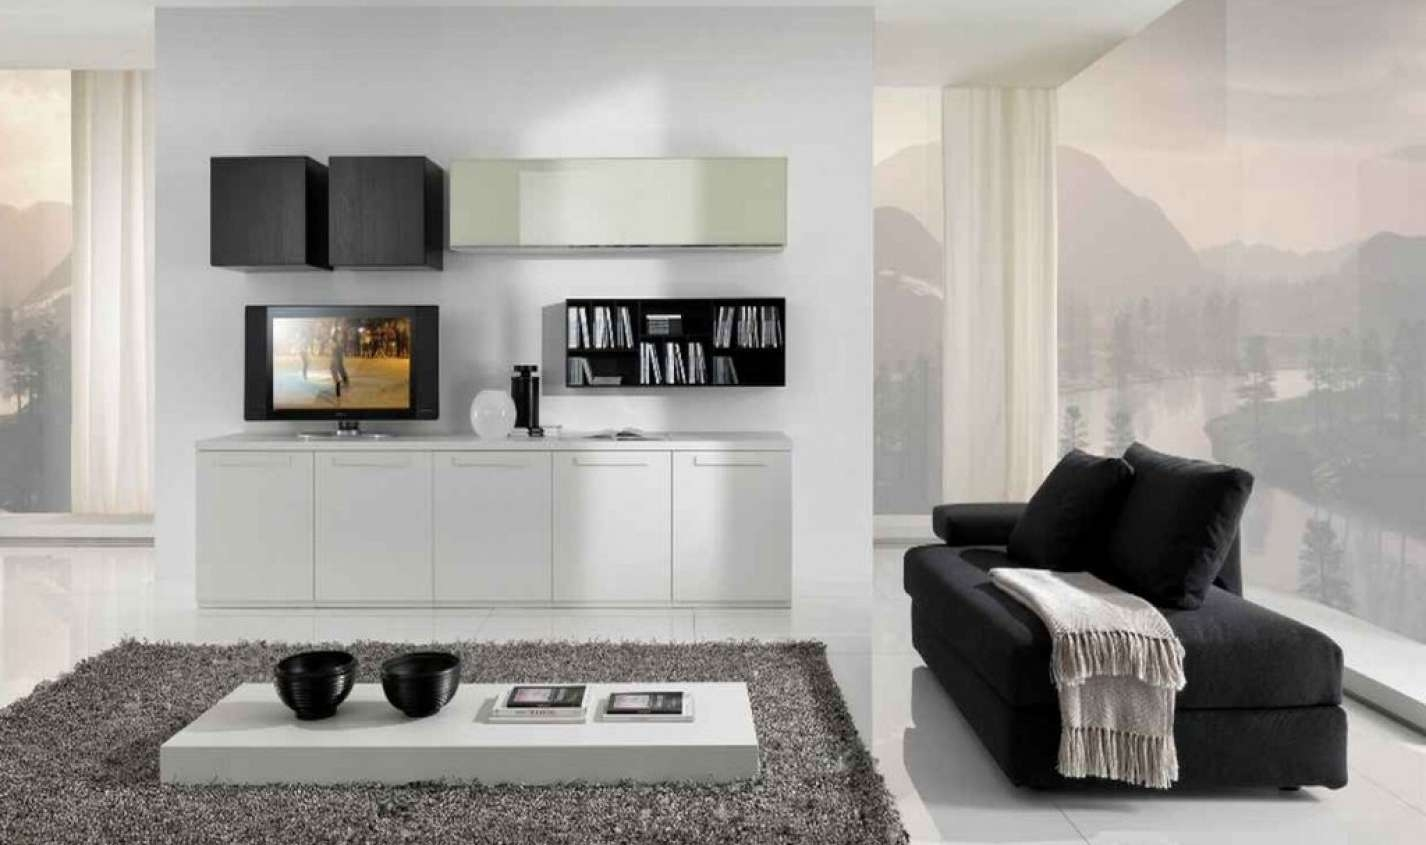 Tv : Slimline Tv Cabinets Imposing Slimline Tv Lift Cabinets Throughout Slimline Tv Cabinets (View 14 of 20)